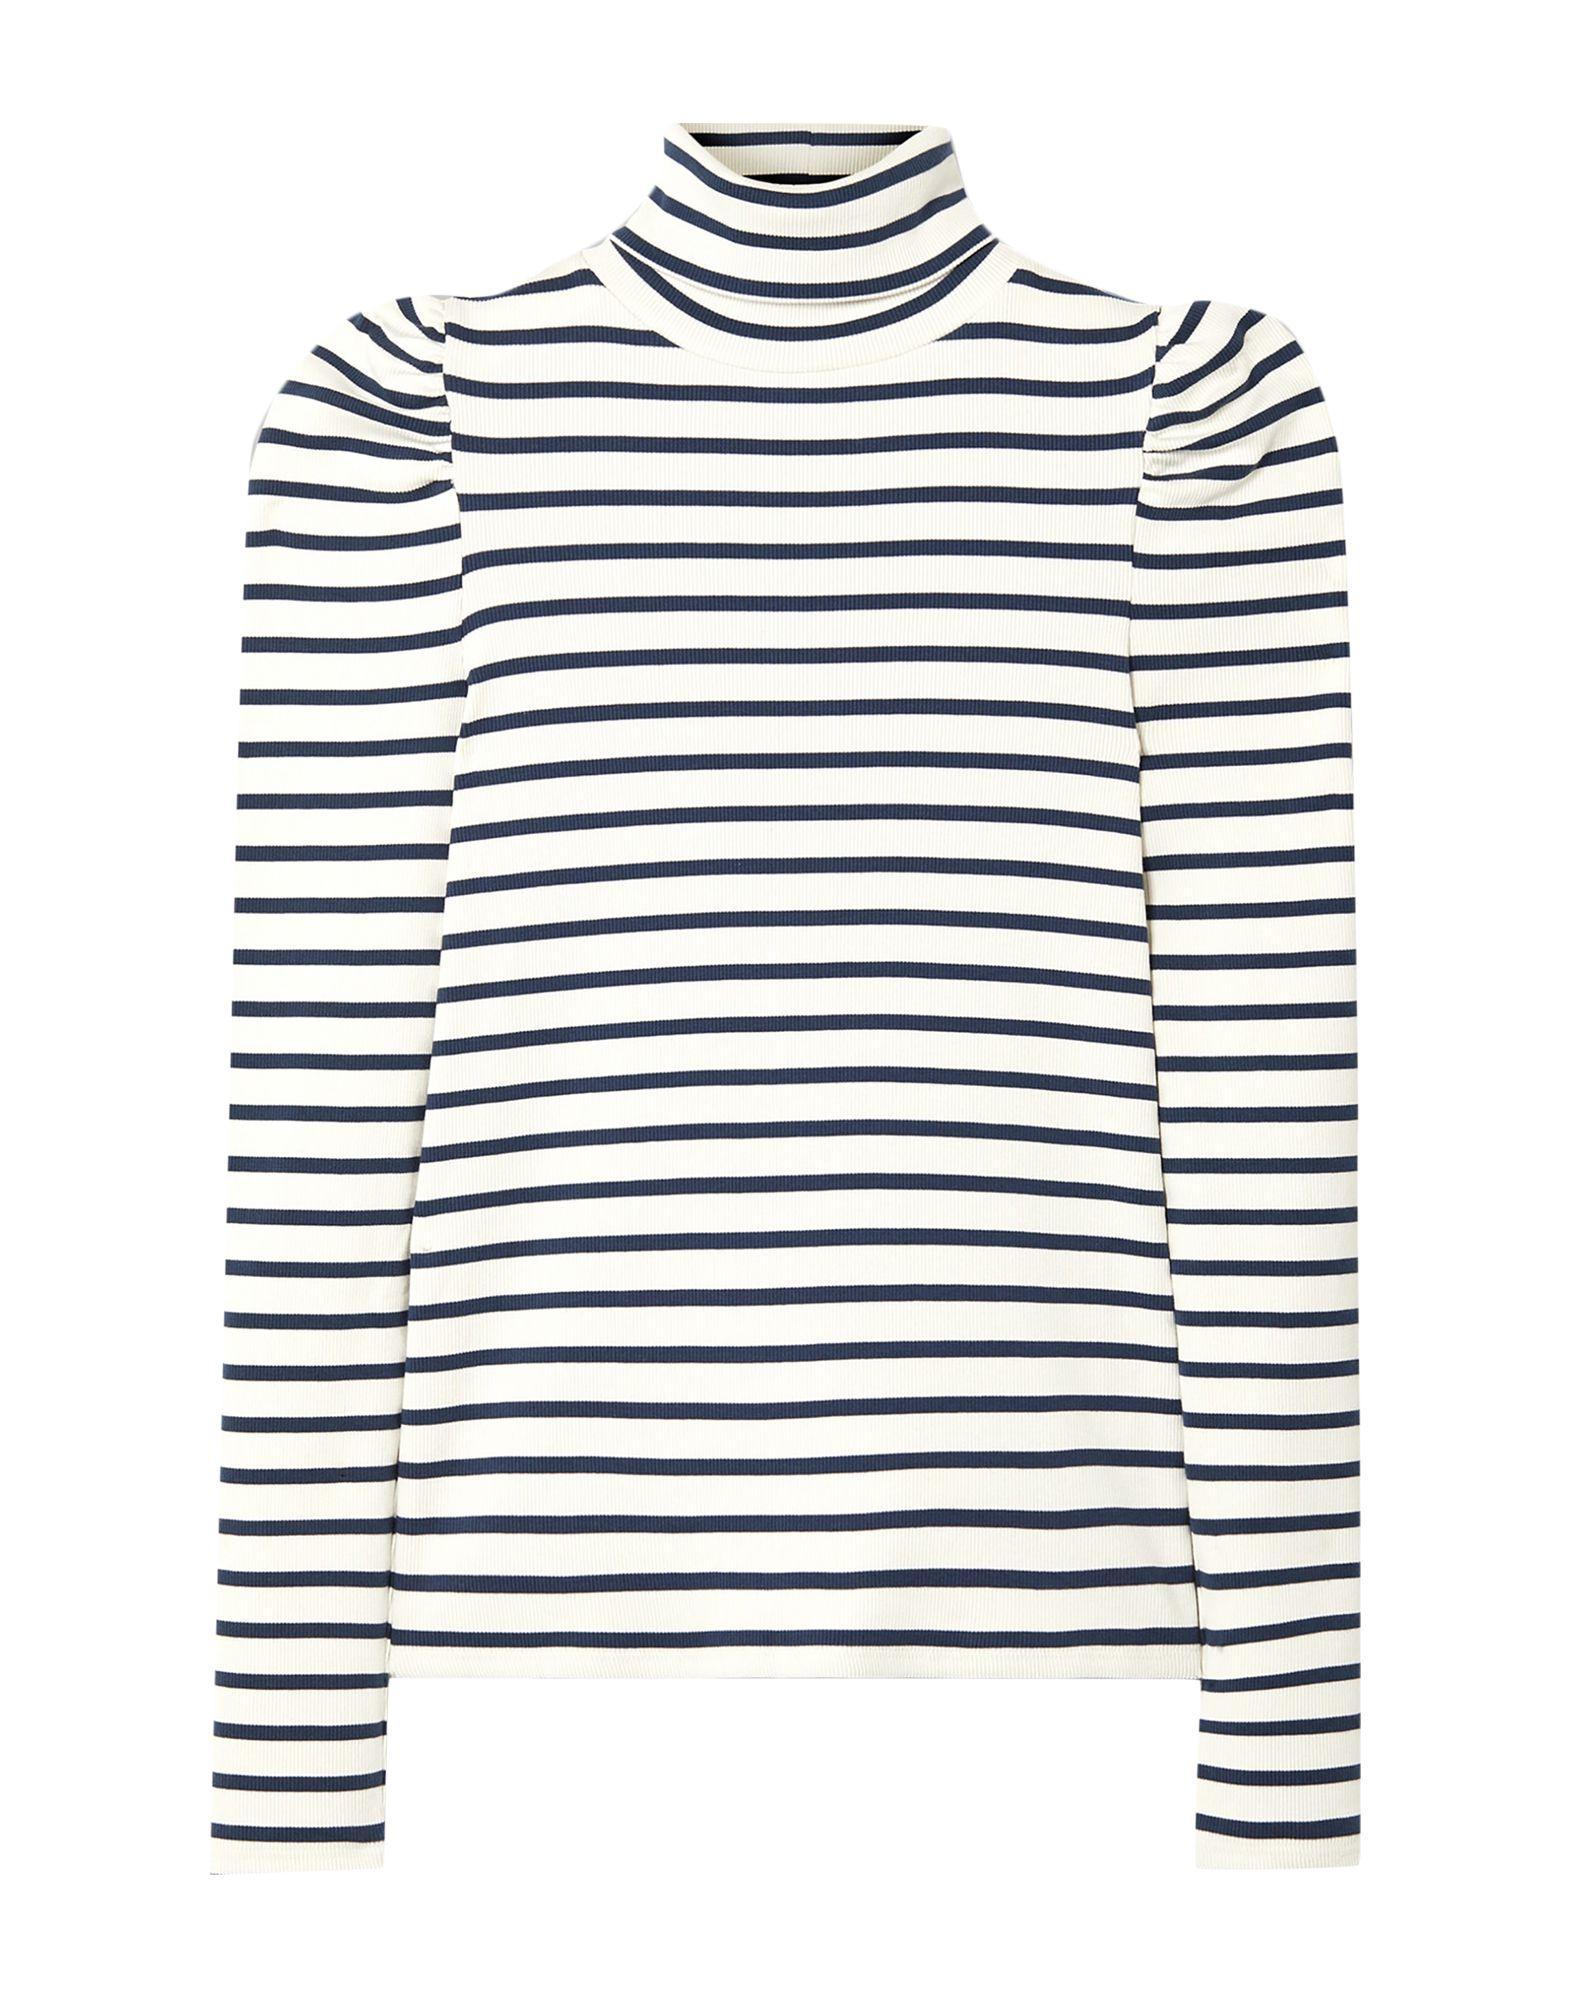 VERONICA BEARD T-shirts. jersey, no appliqués, stripes, turtleneck, long sleeves, no pockets, stretch. 97% Supima Cotton, 3% Elastane